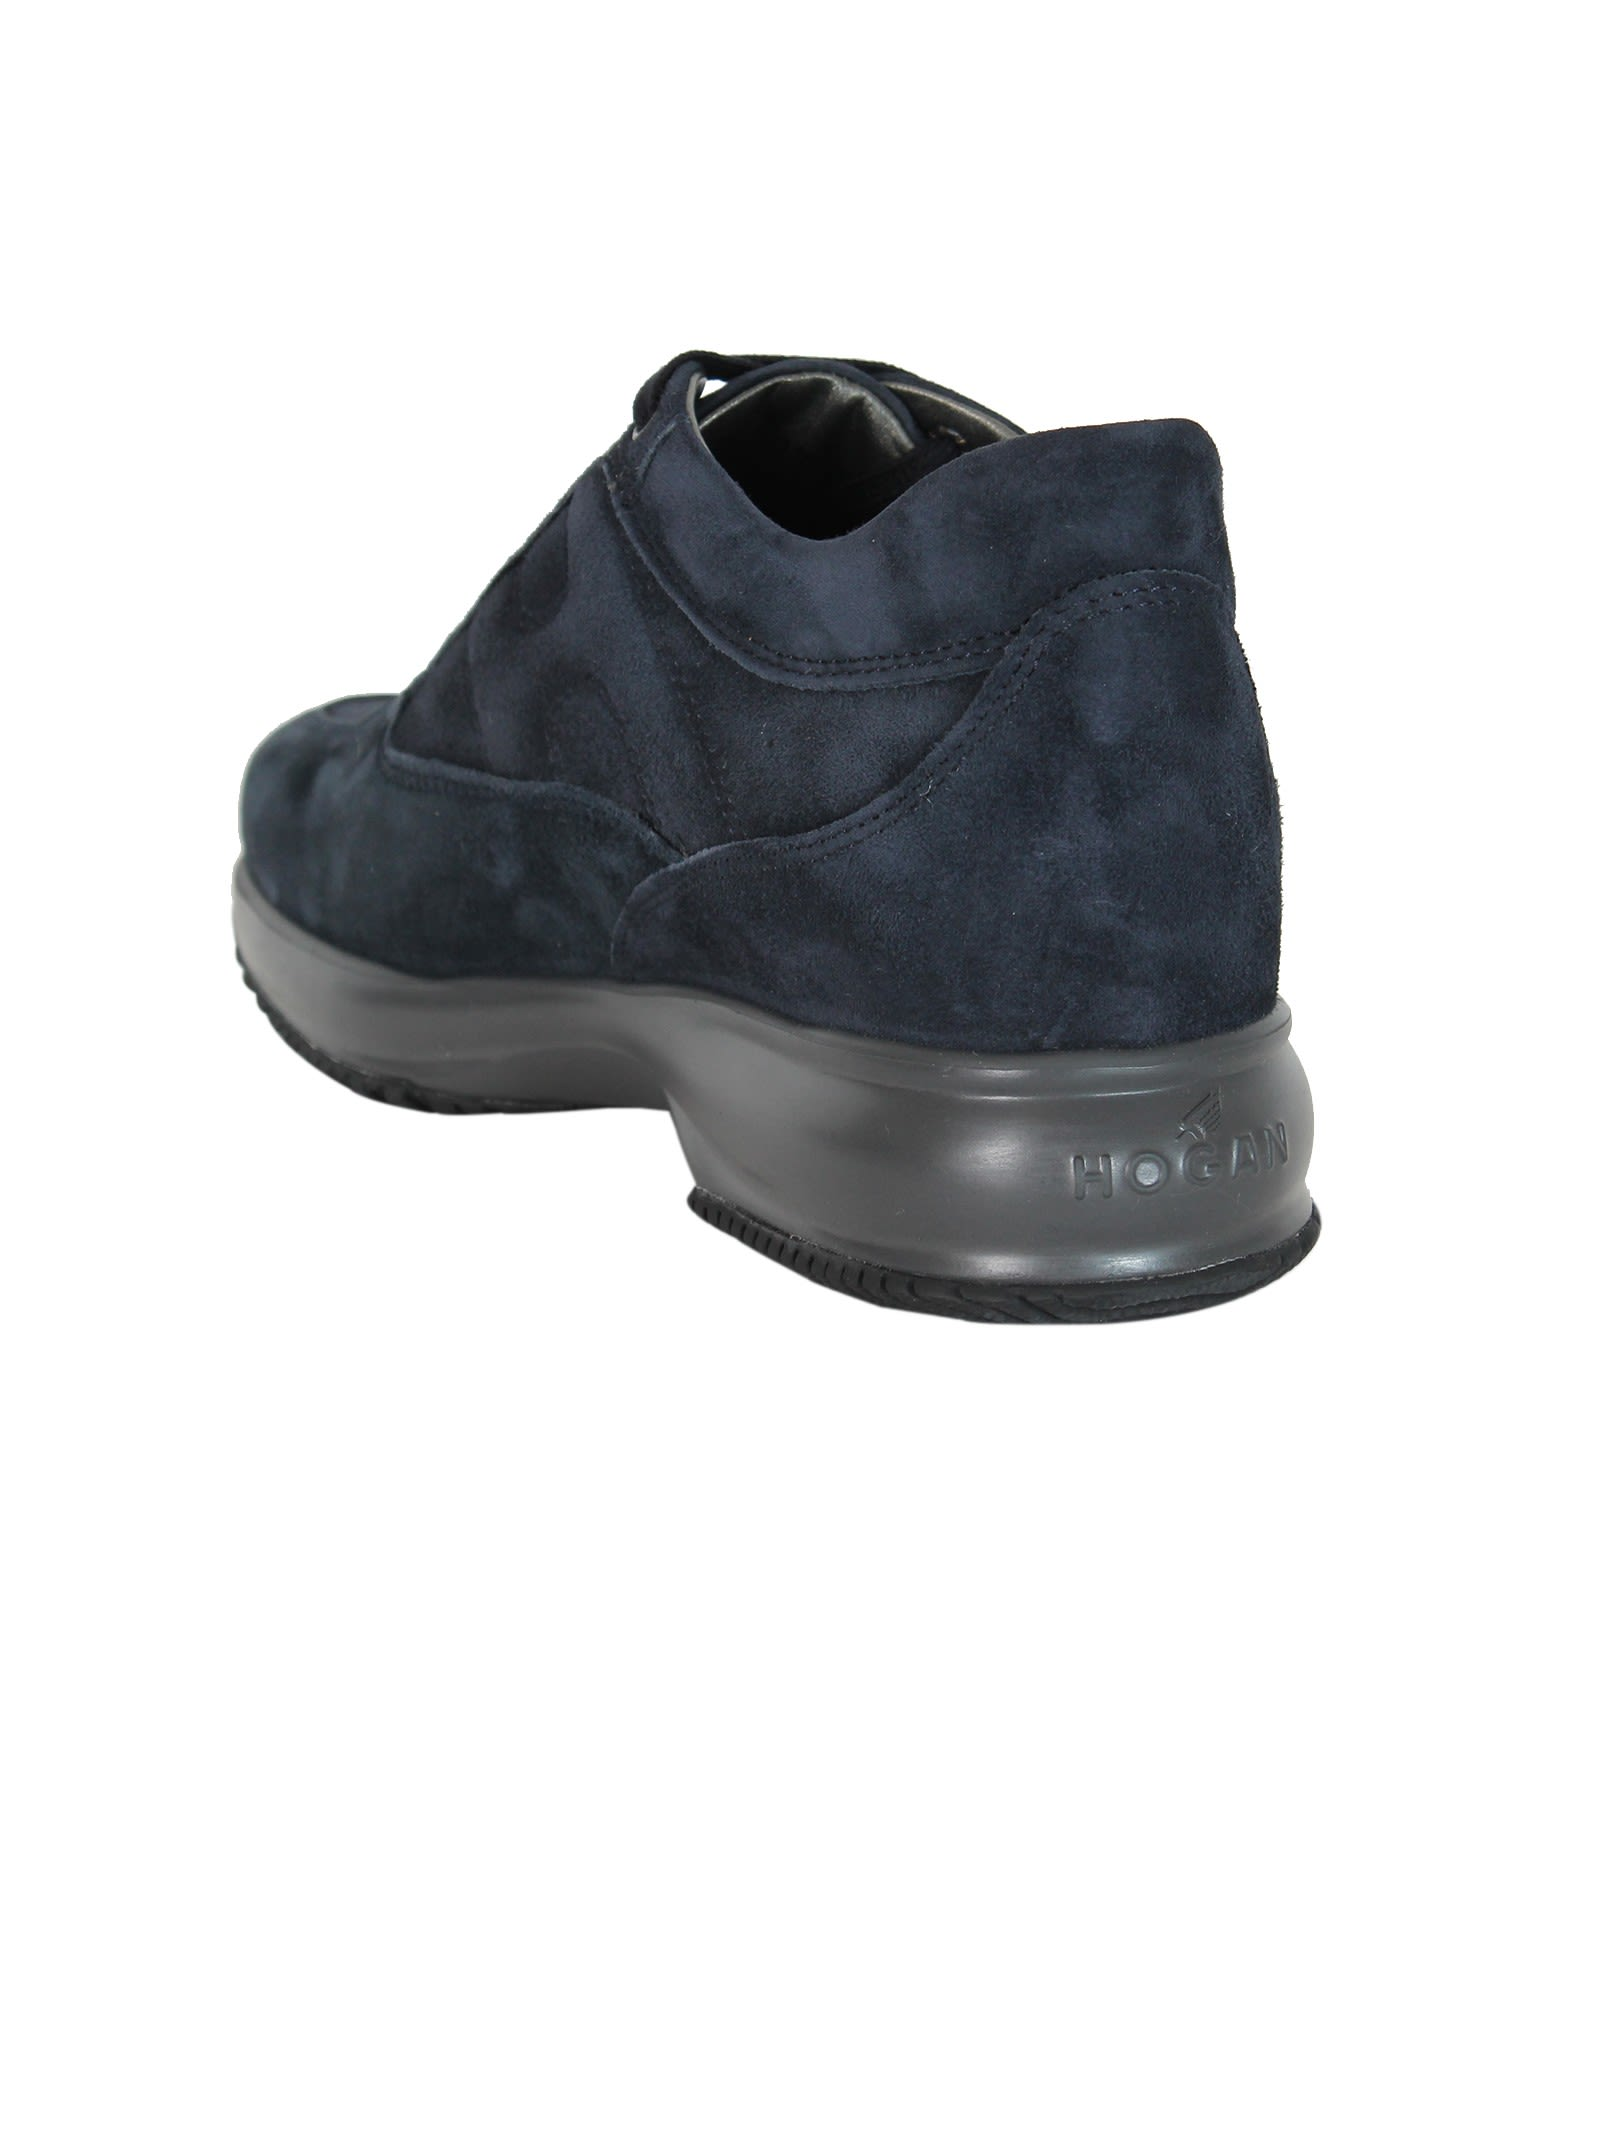 Blue suede Interactive sneakers Hogan riuNW6BYF